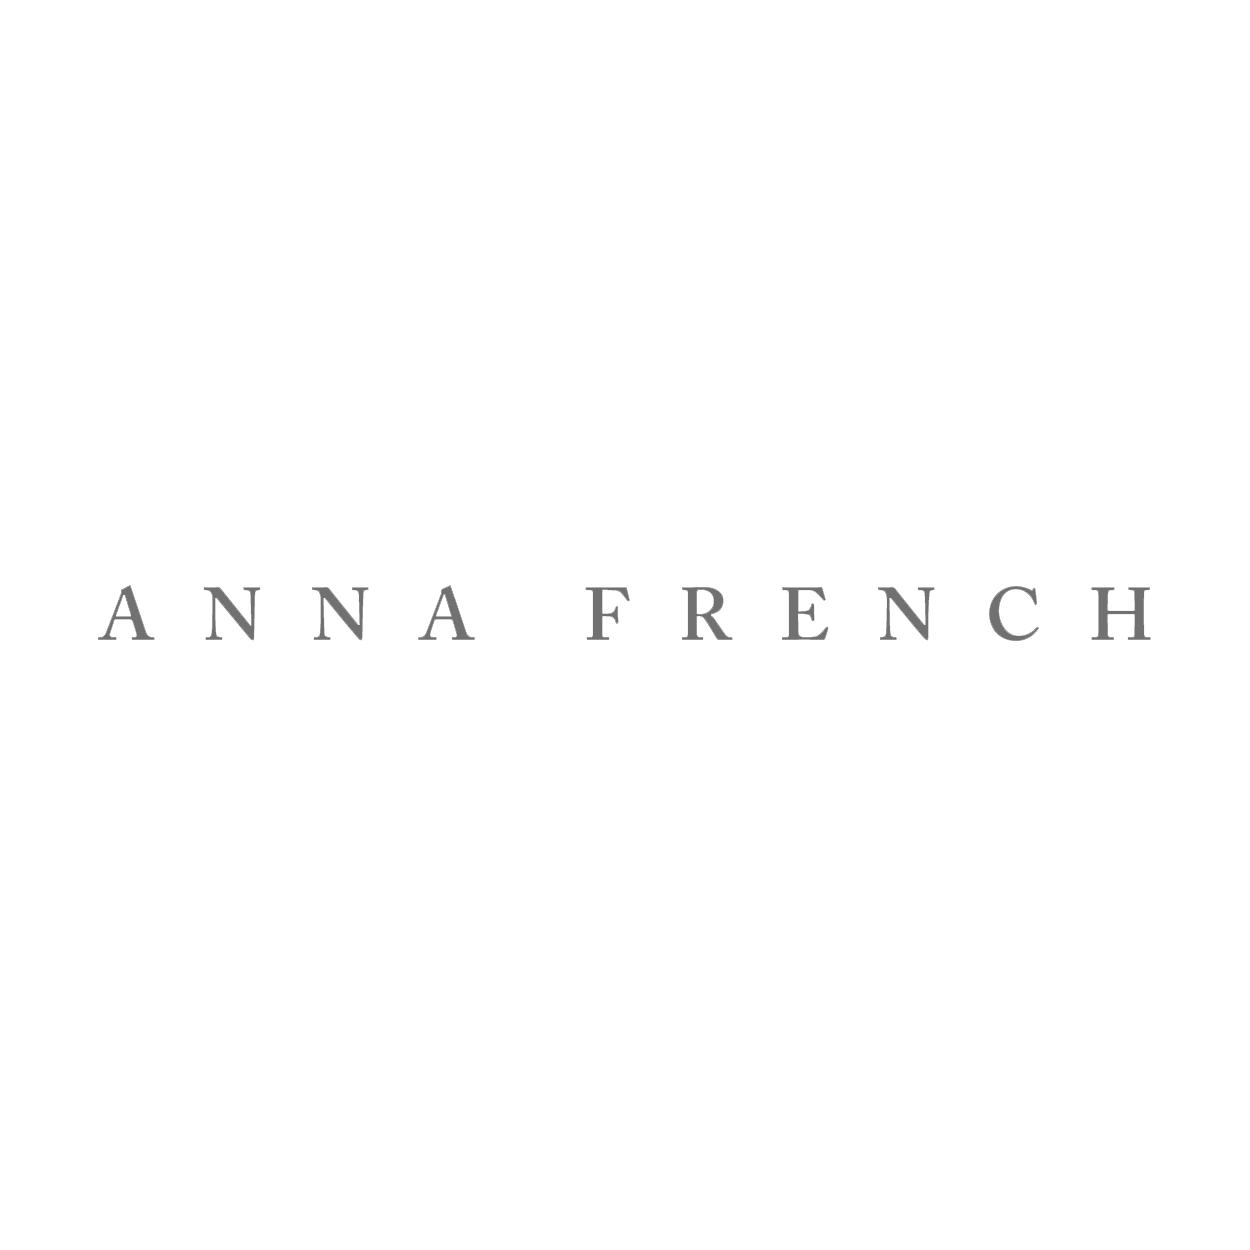 logo_annafrench_gray